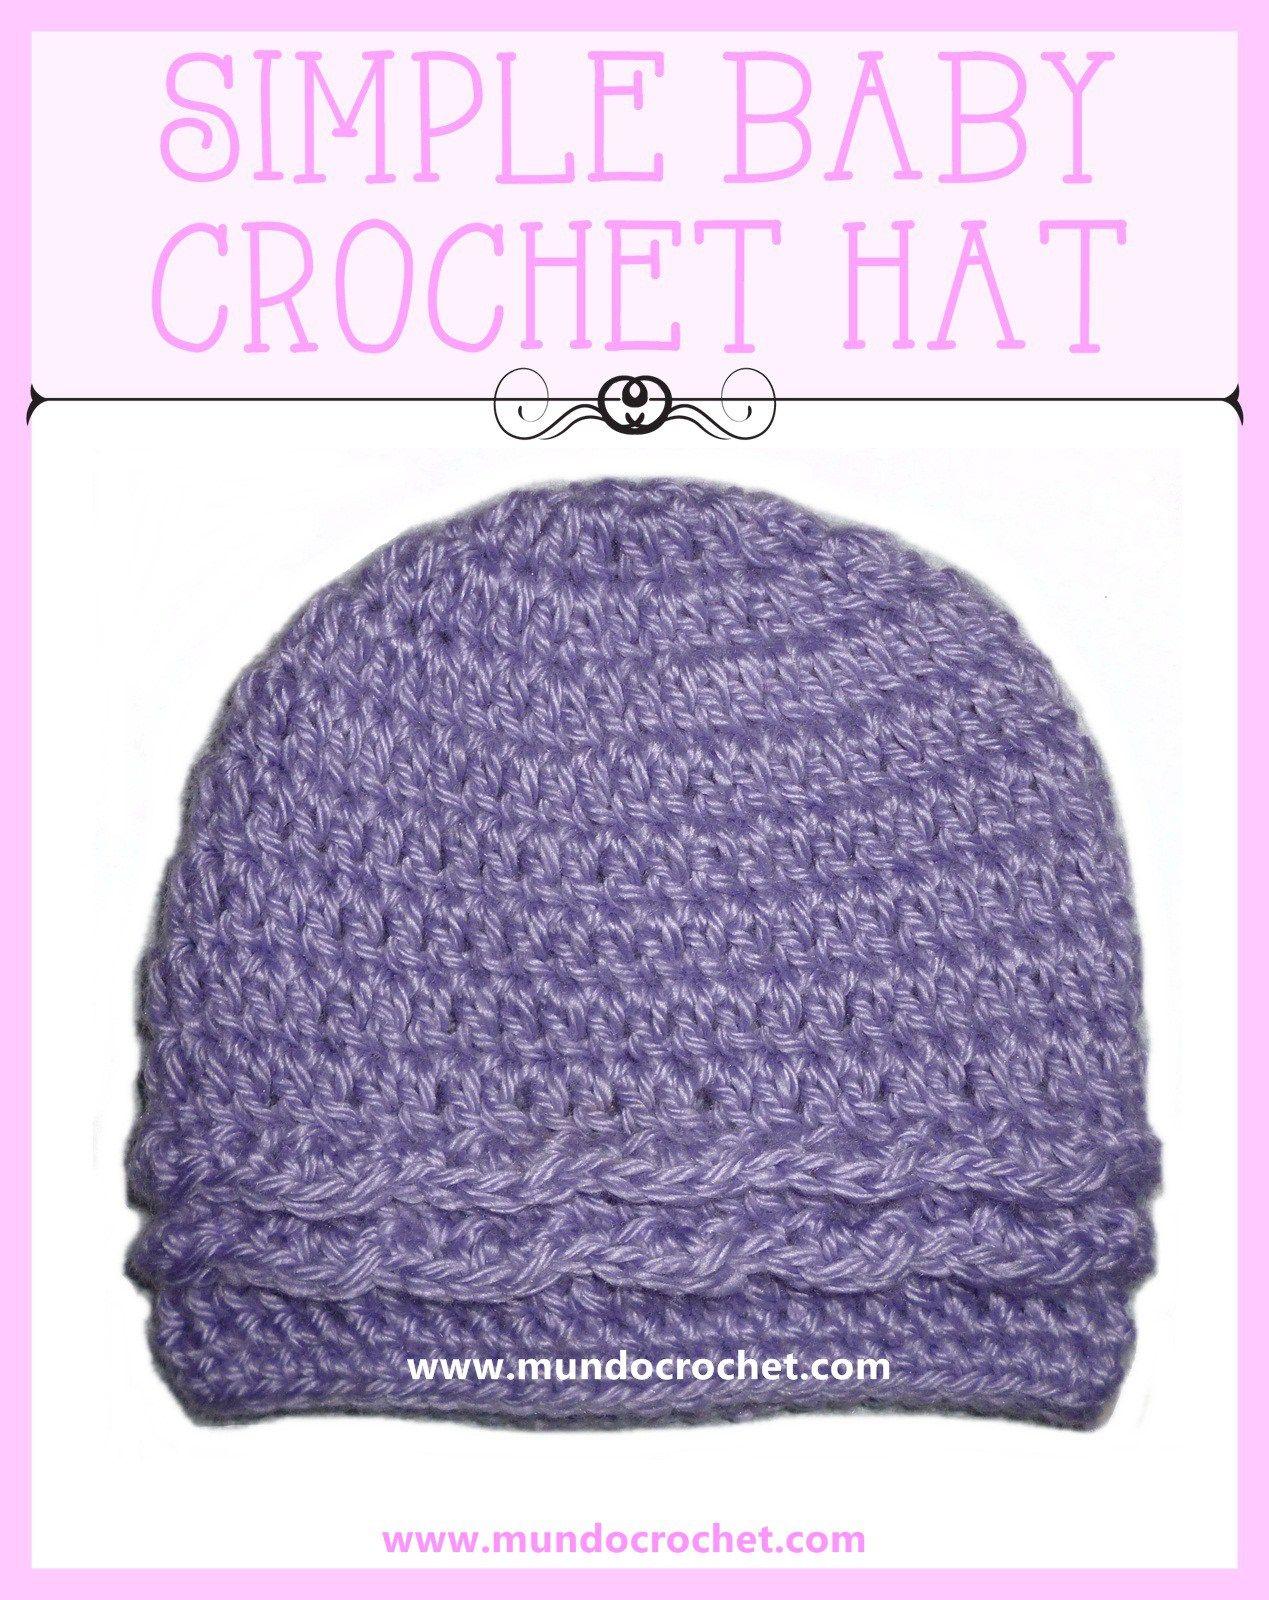 Simple baby Crochet hat | Crochet for babies/kids | Pinterest